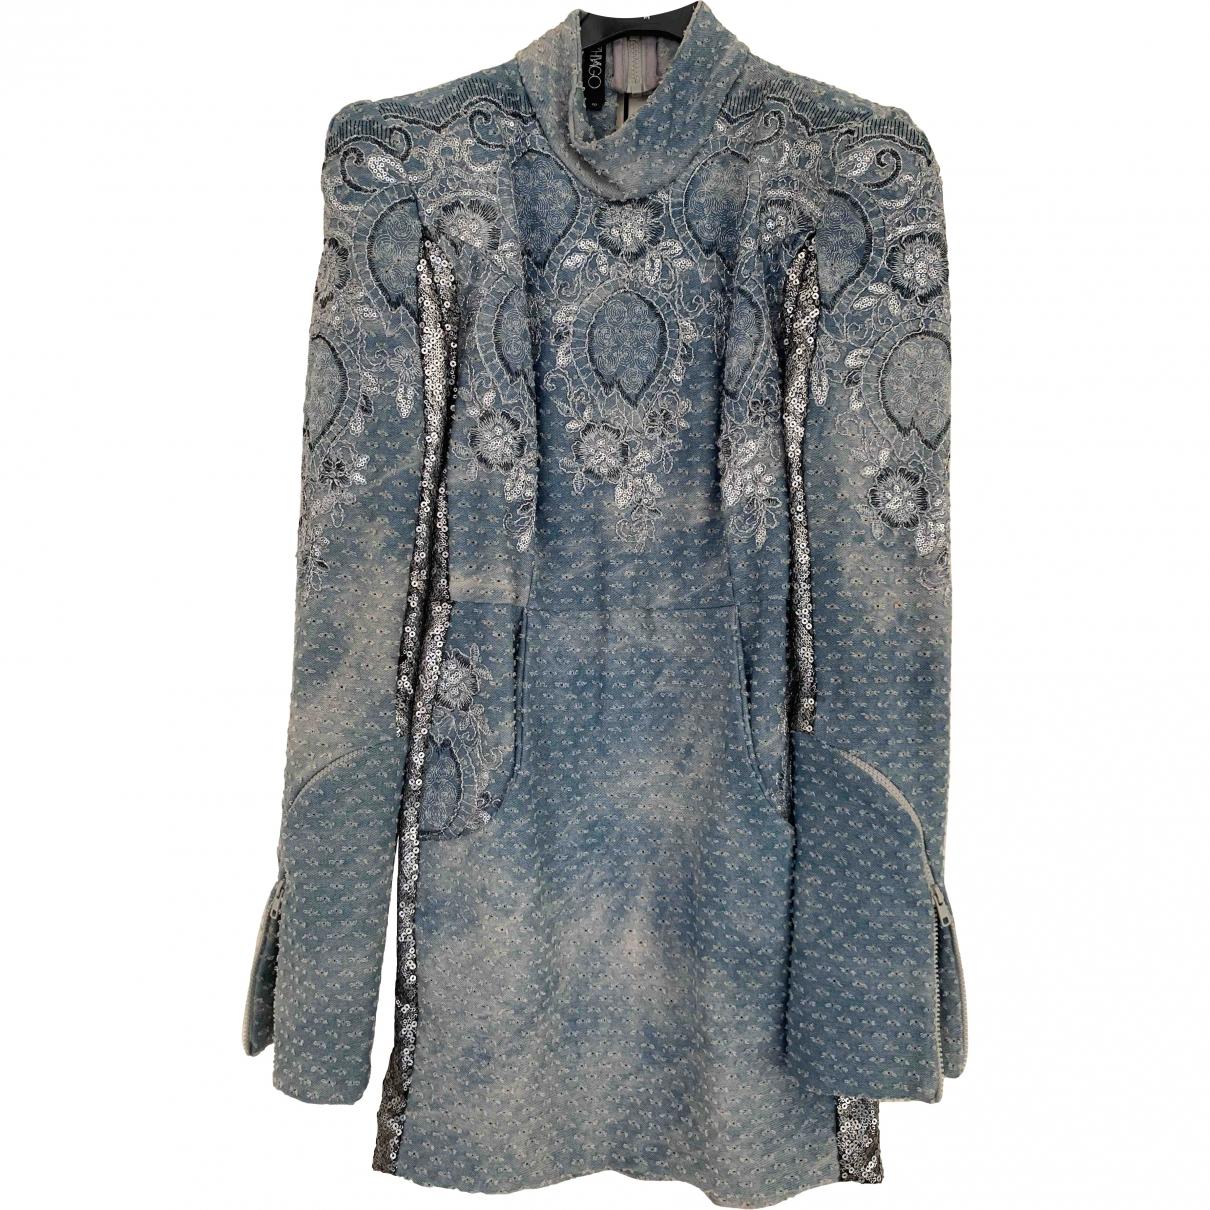 Zhivago \N Blue Cotton dress for Women 10 UK